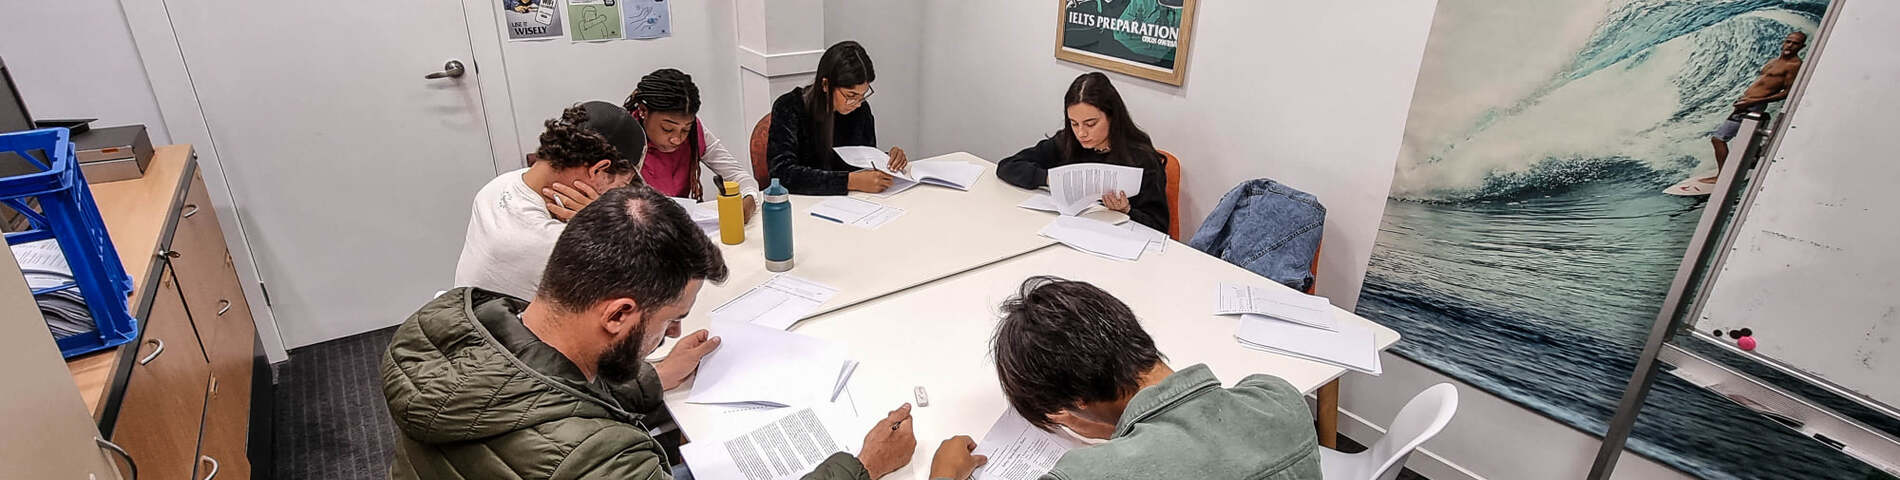 Burleigh Heads Language College bilde 1